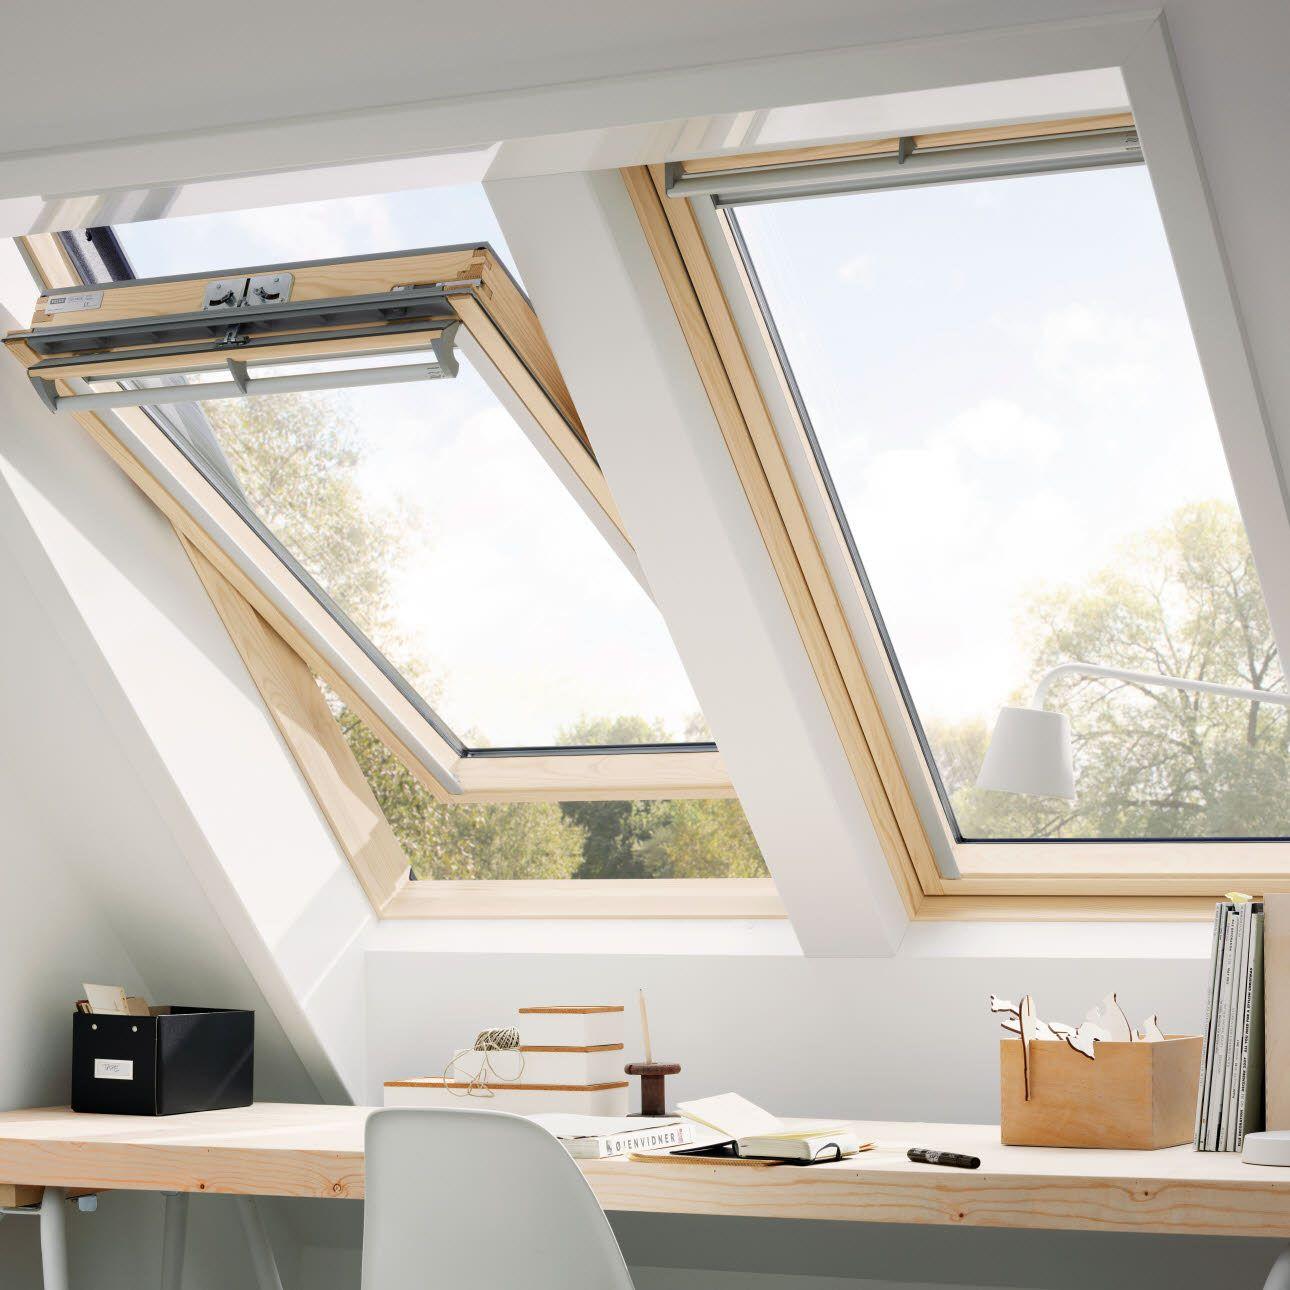 Velux window ideas  roof windows  velux windows  windows  magnet trade  room